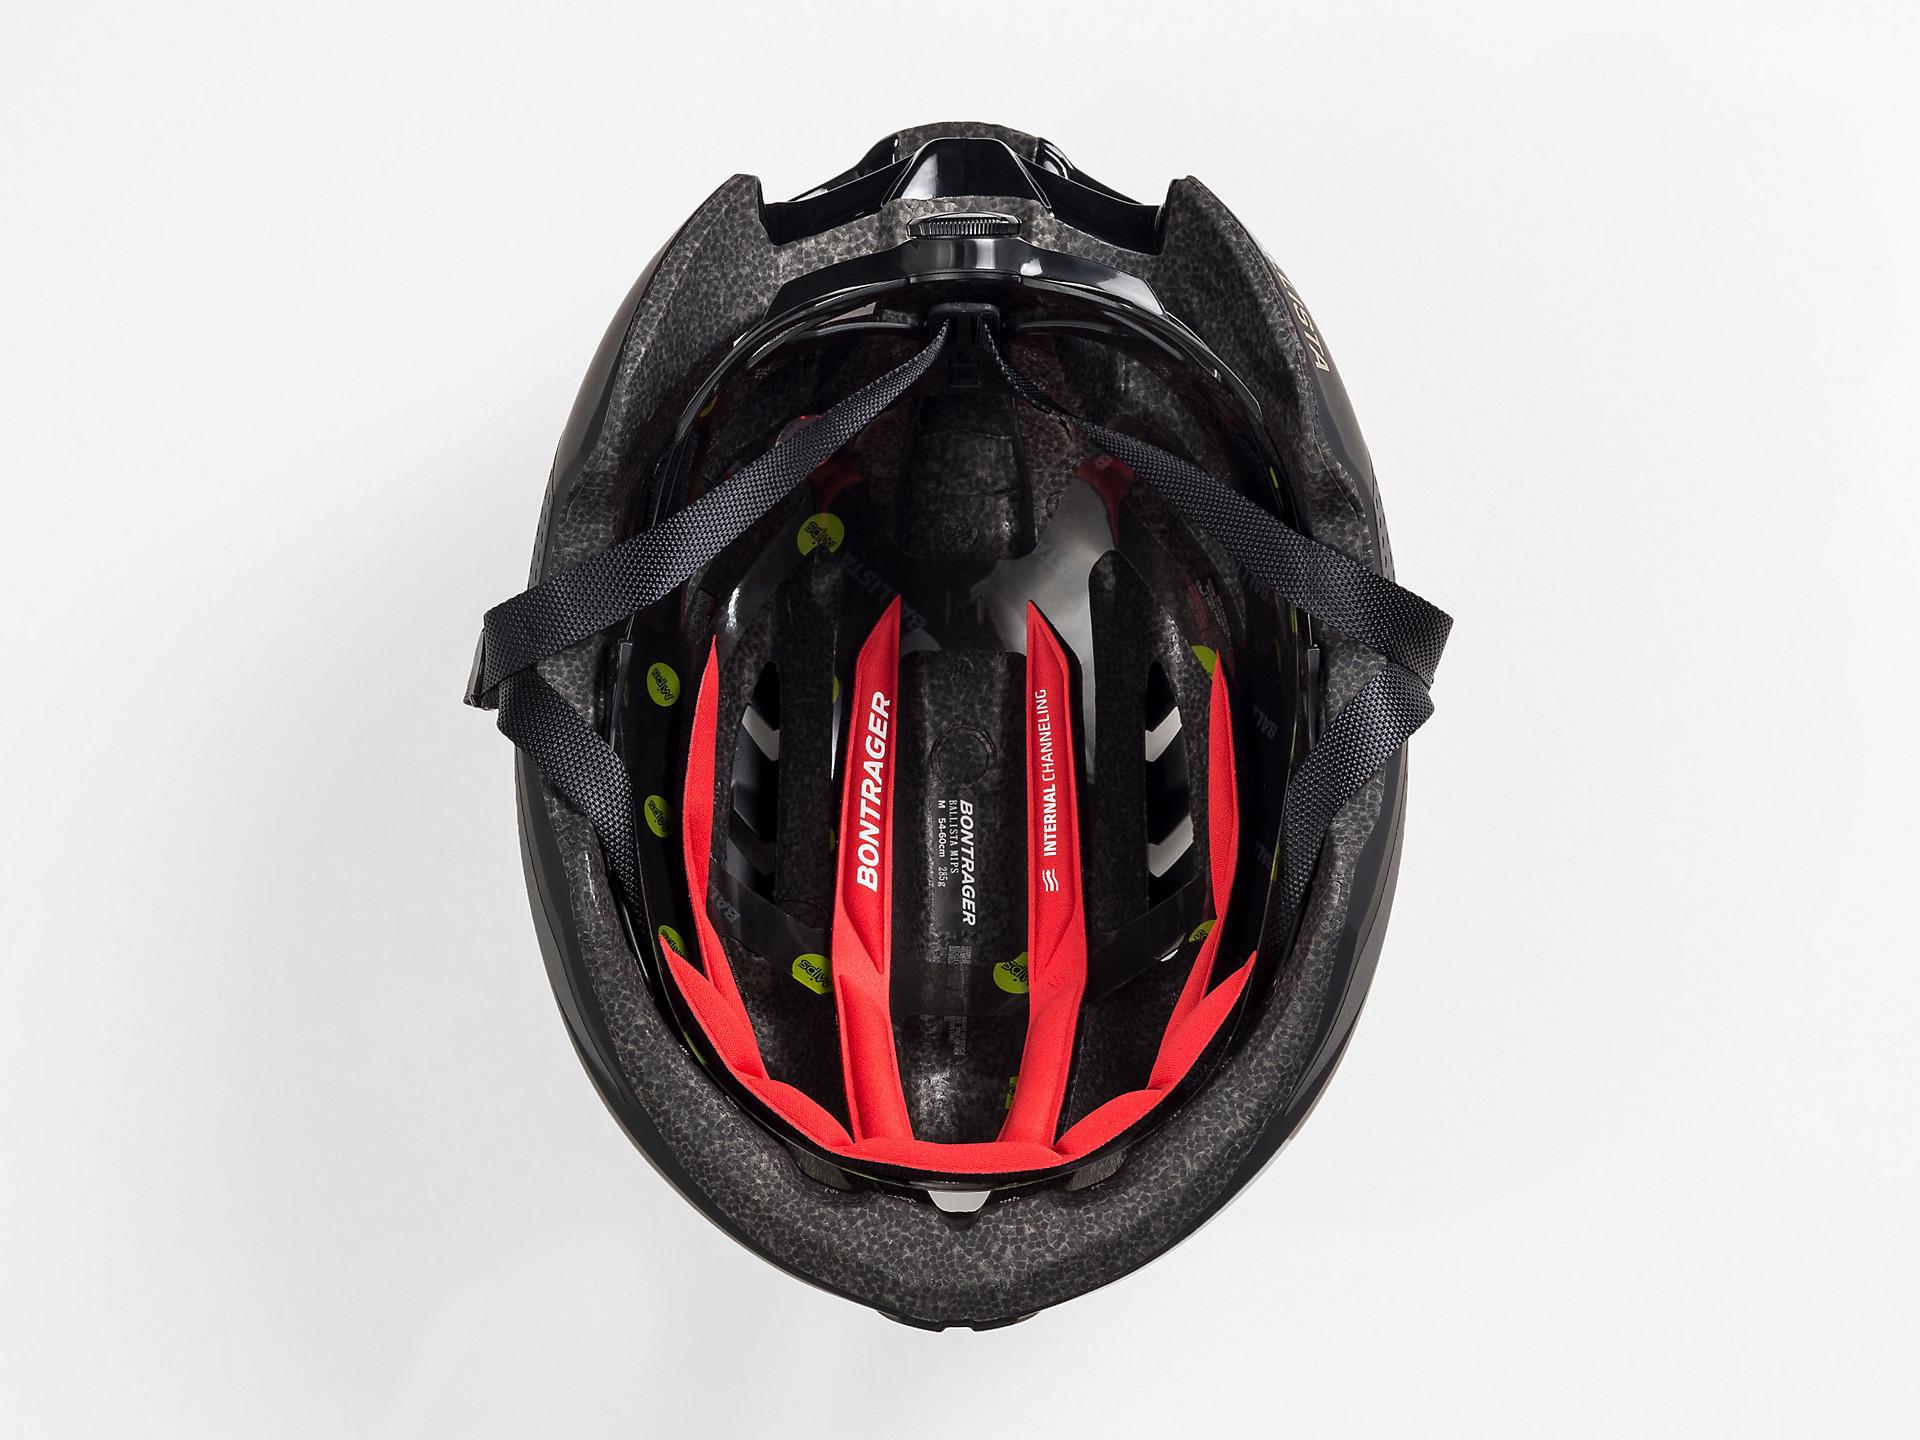 Bontrager Ballista MIPS landevejshjelm | Trek Bikes (DK)